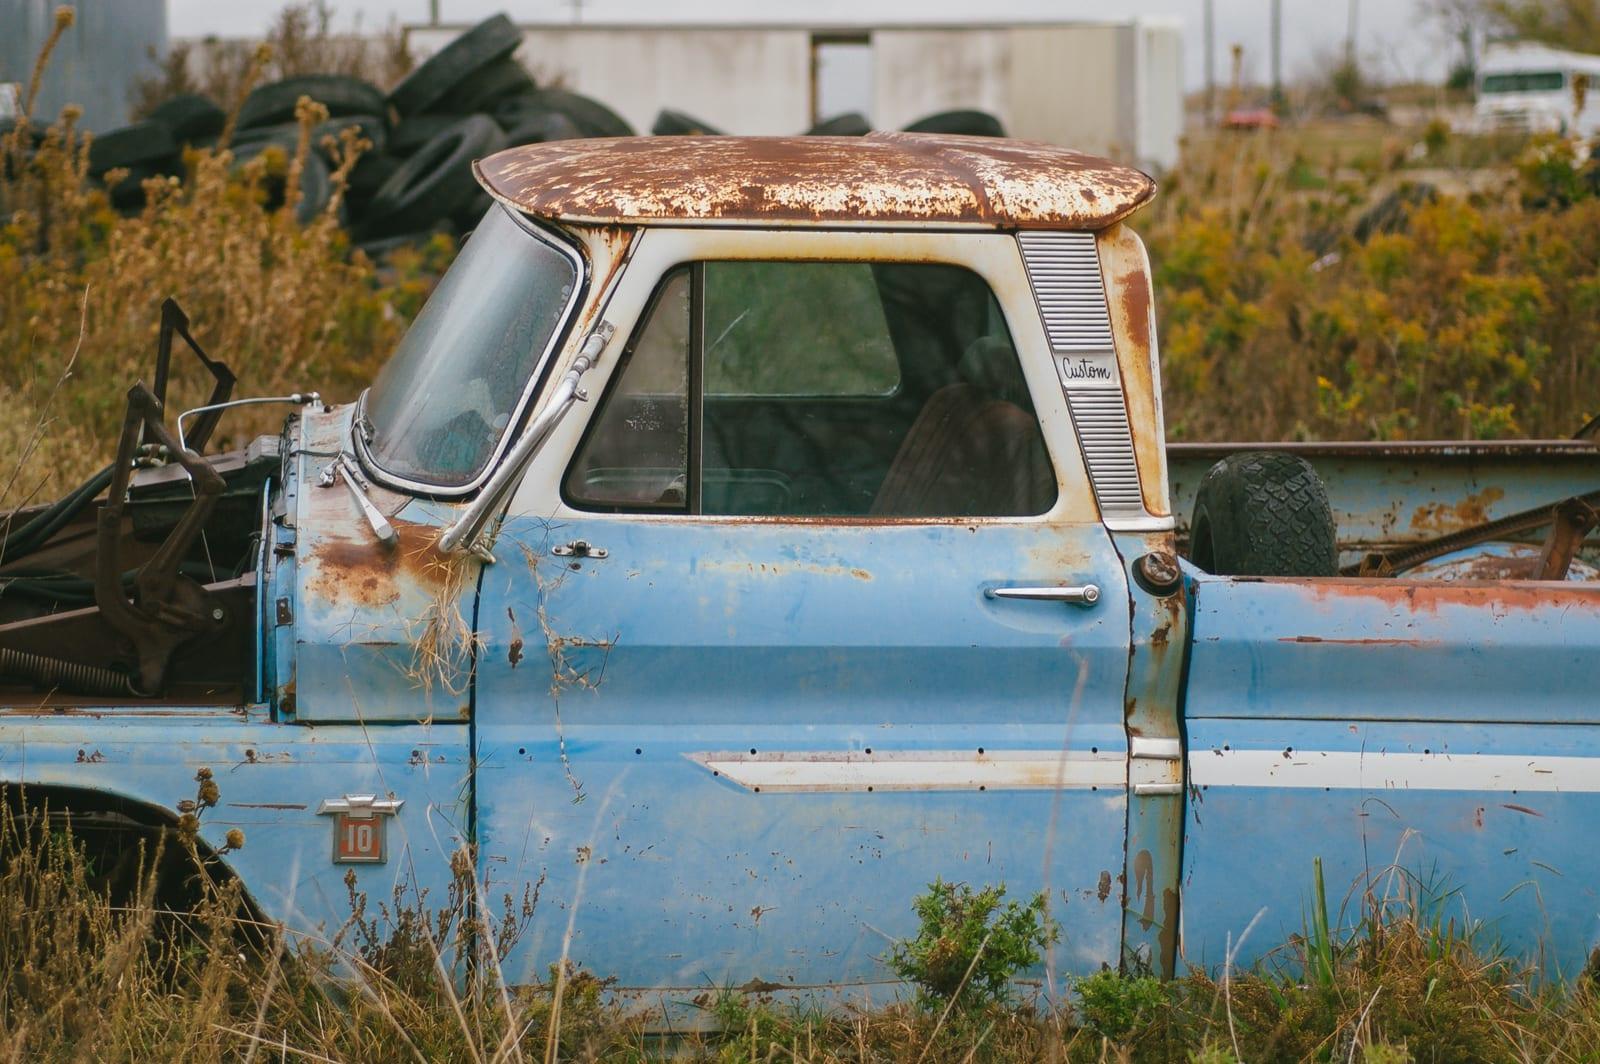 Urban Exploring An Abandoned Junkyard Of Rusty Cars in Terrell, Texas